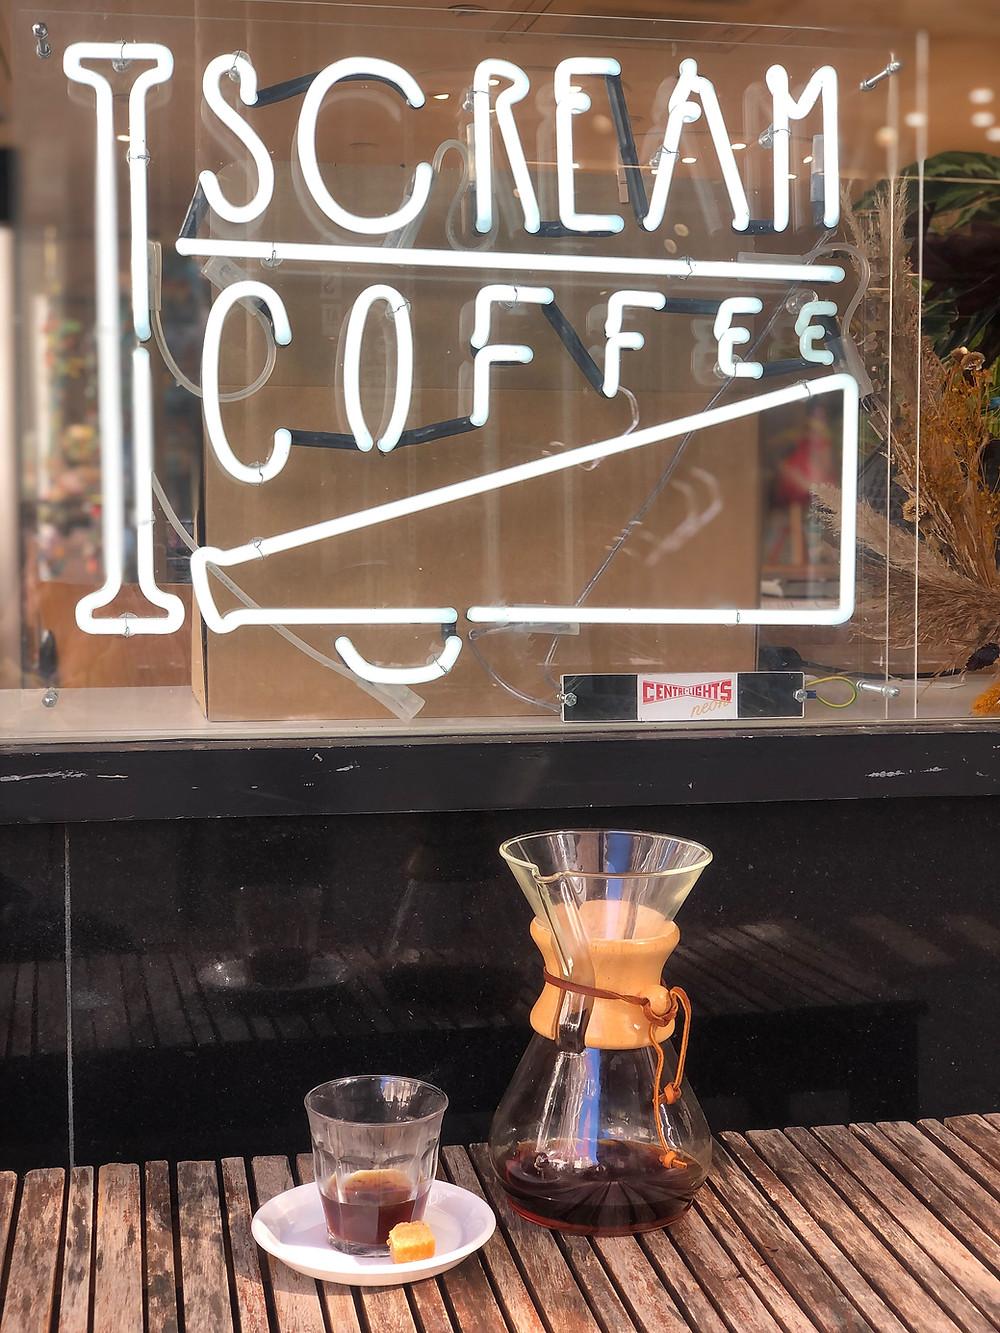 'I Scream Coffee' in Leiden